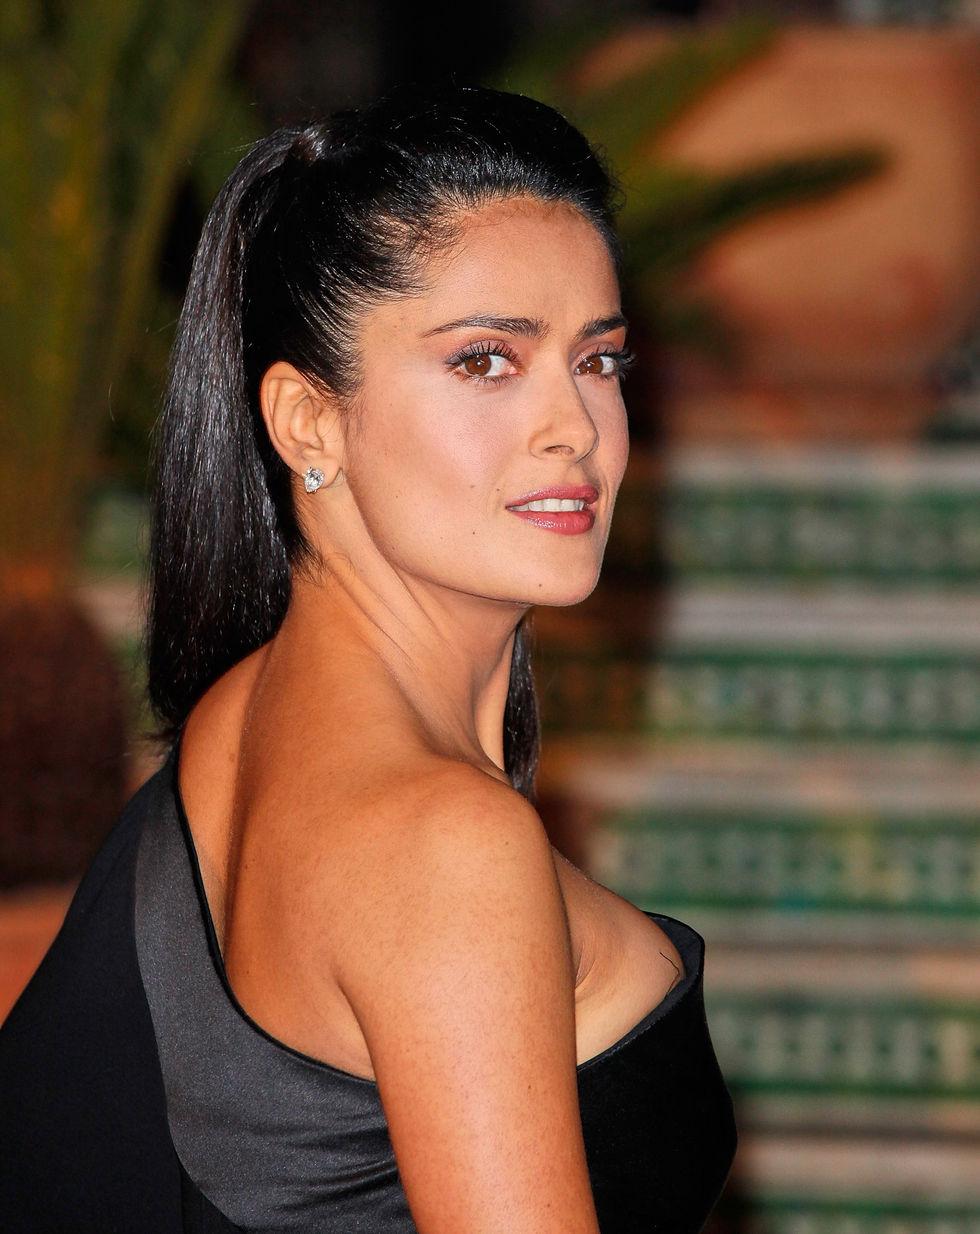 Mexican Actress Salma Hayek In Black Dress